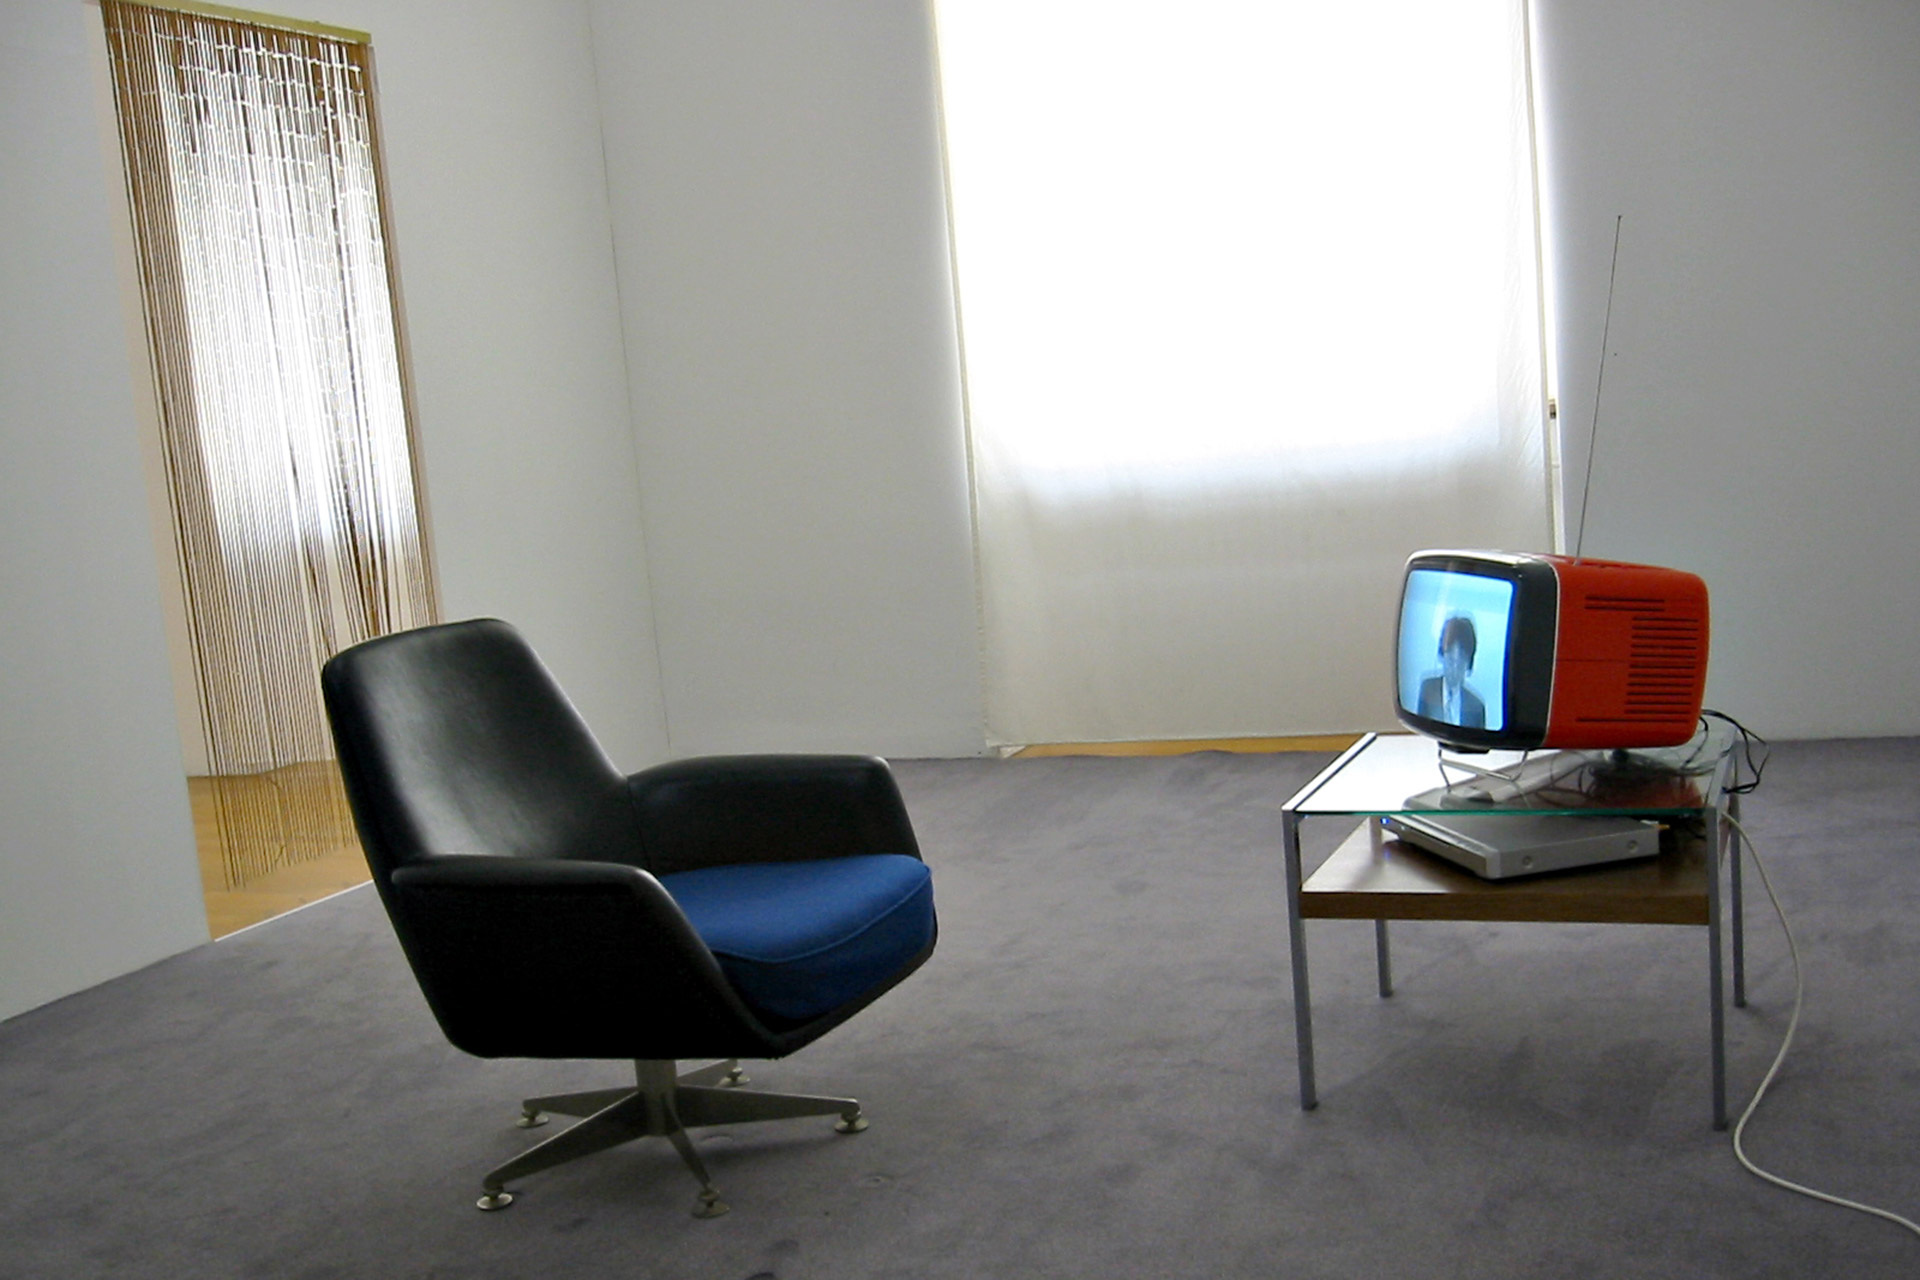 Tamy-Ben-Tor-Kunsthalle-Winterthur-2008-1.jpg